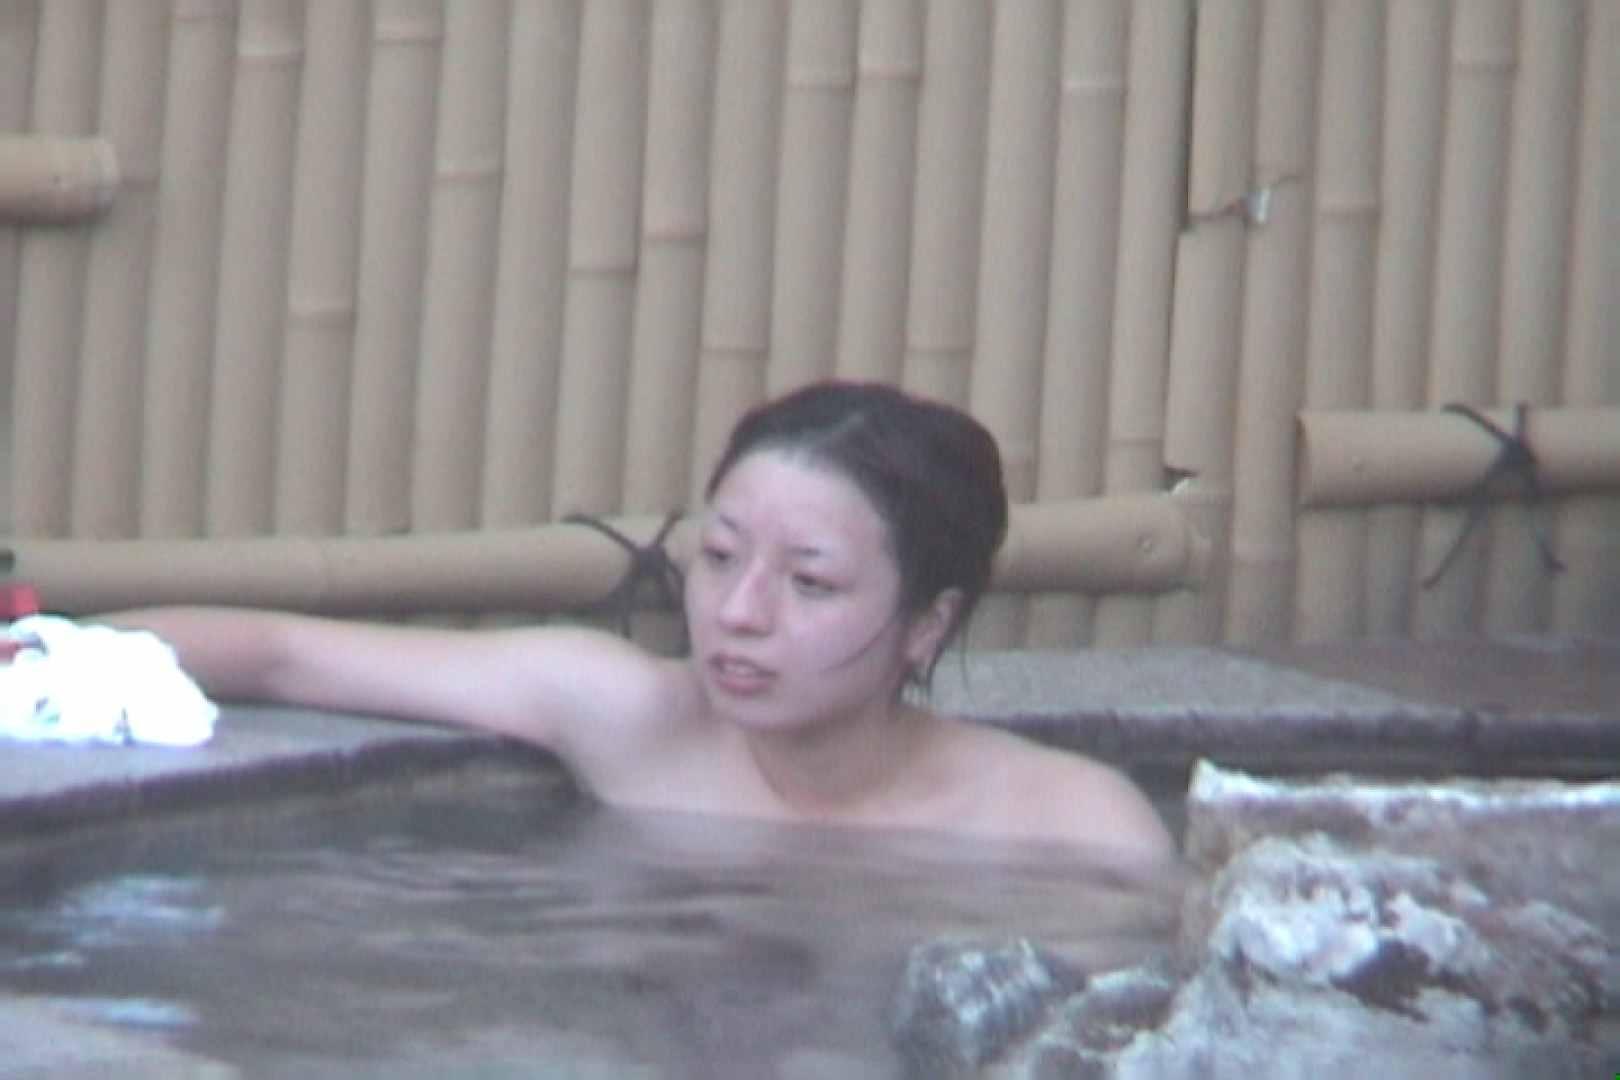 Aquaな露天風呂Vol.608 盗撮 戯れ無修正画像 69連発 38